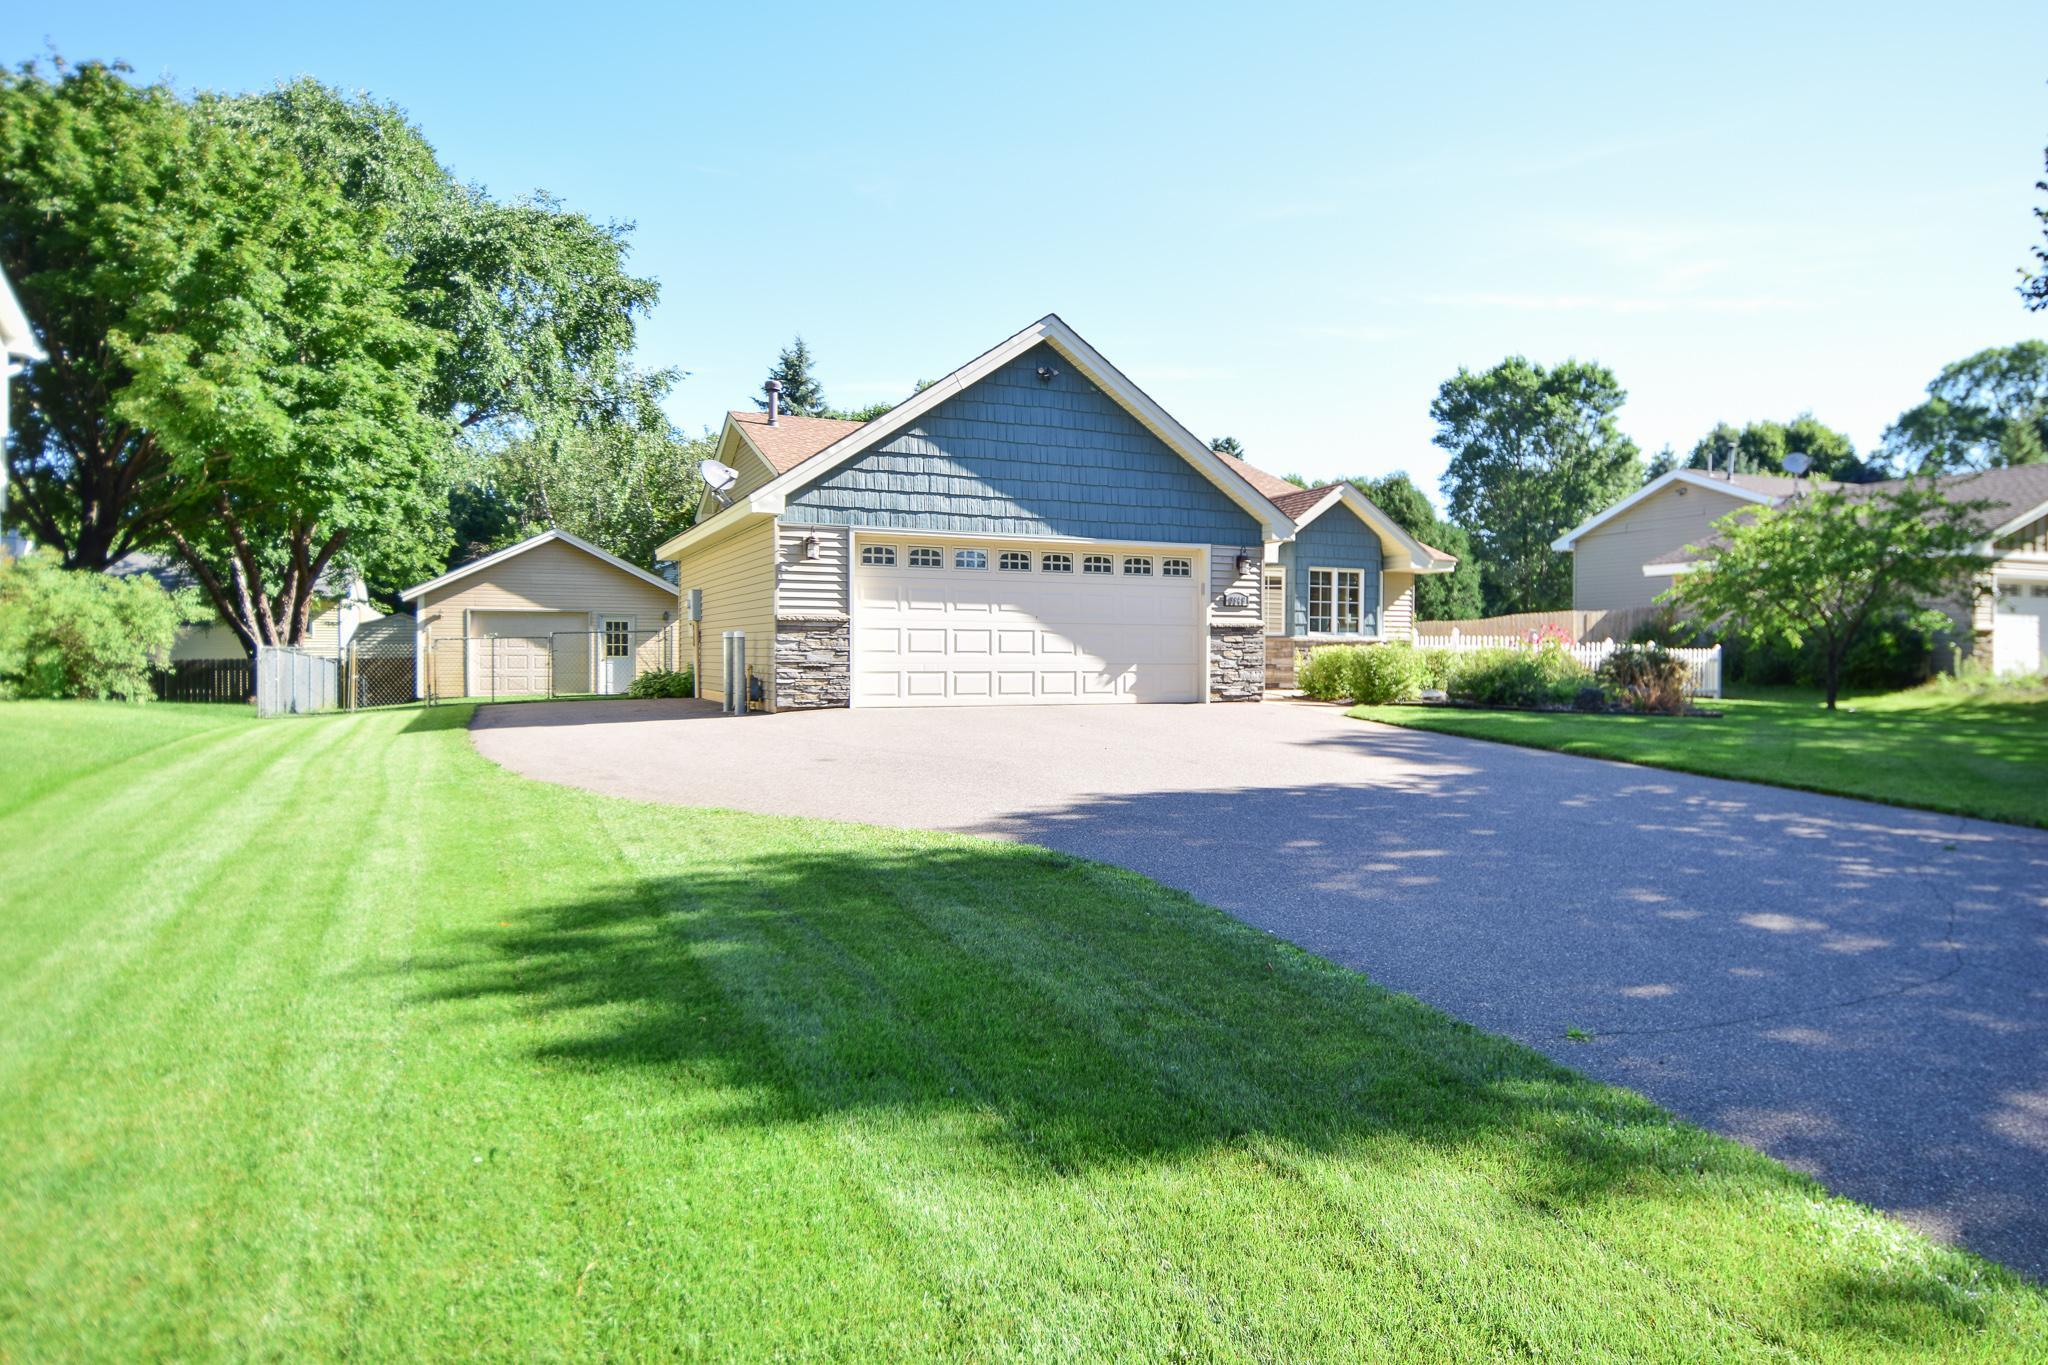 3949 86th Avenue NE Property Photo - Circle Pines, MN real estate listing